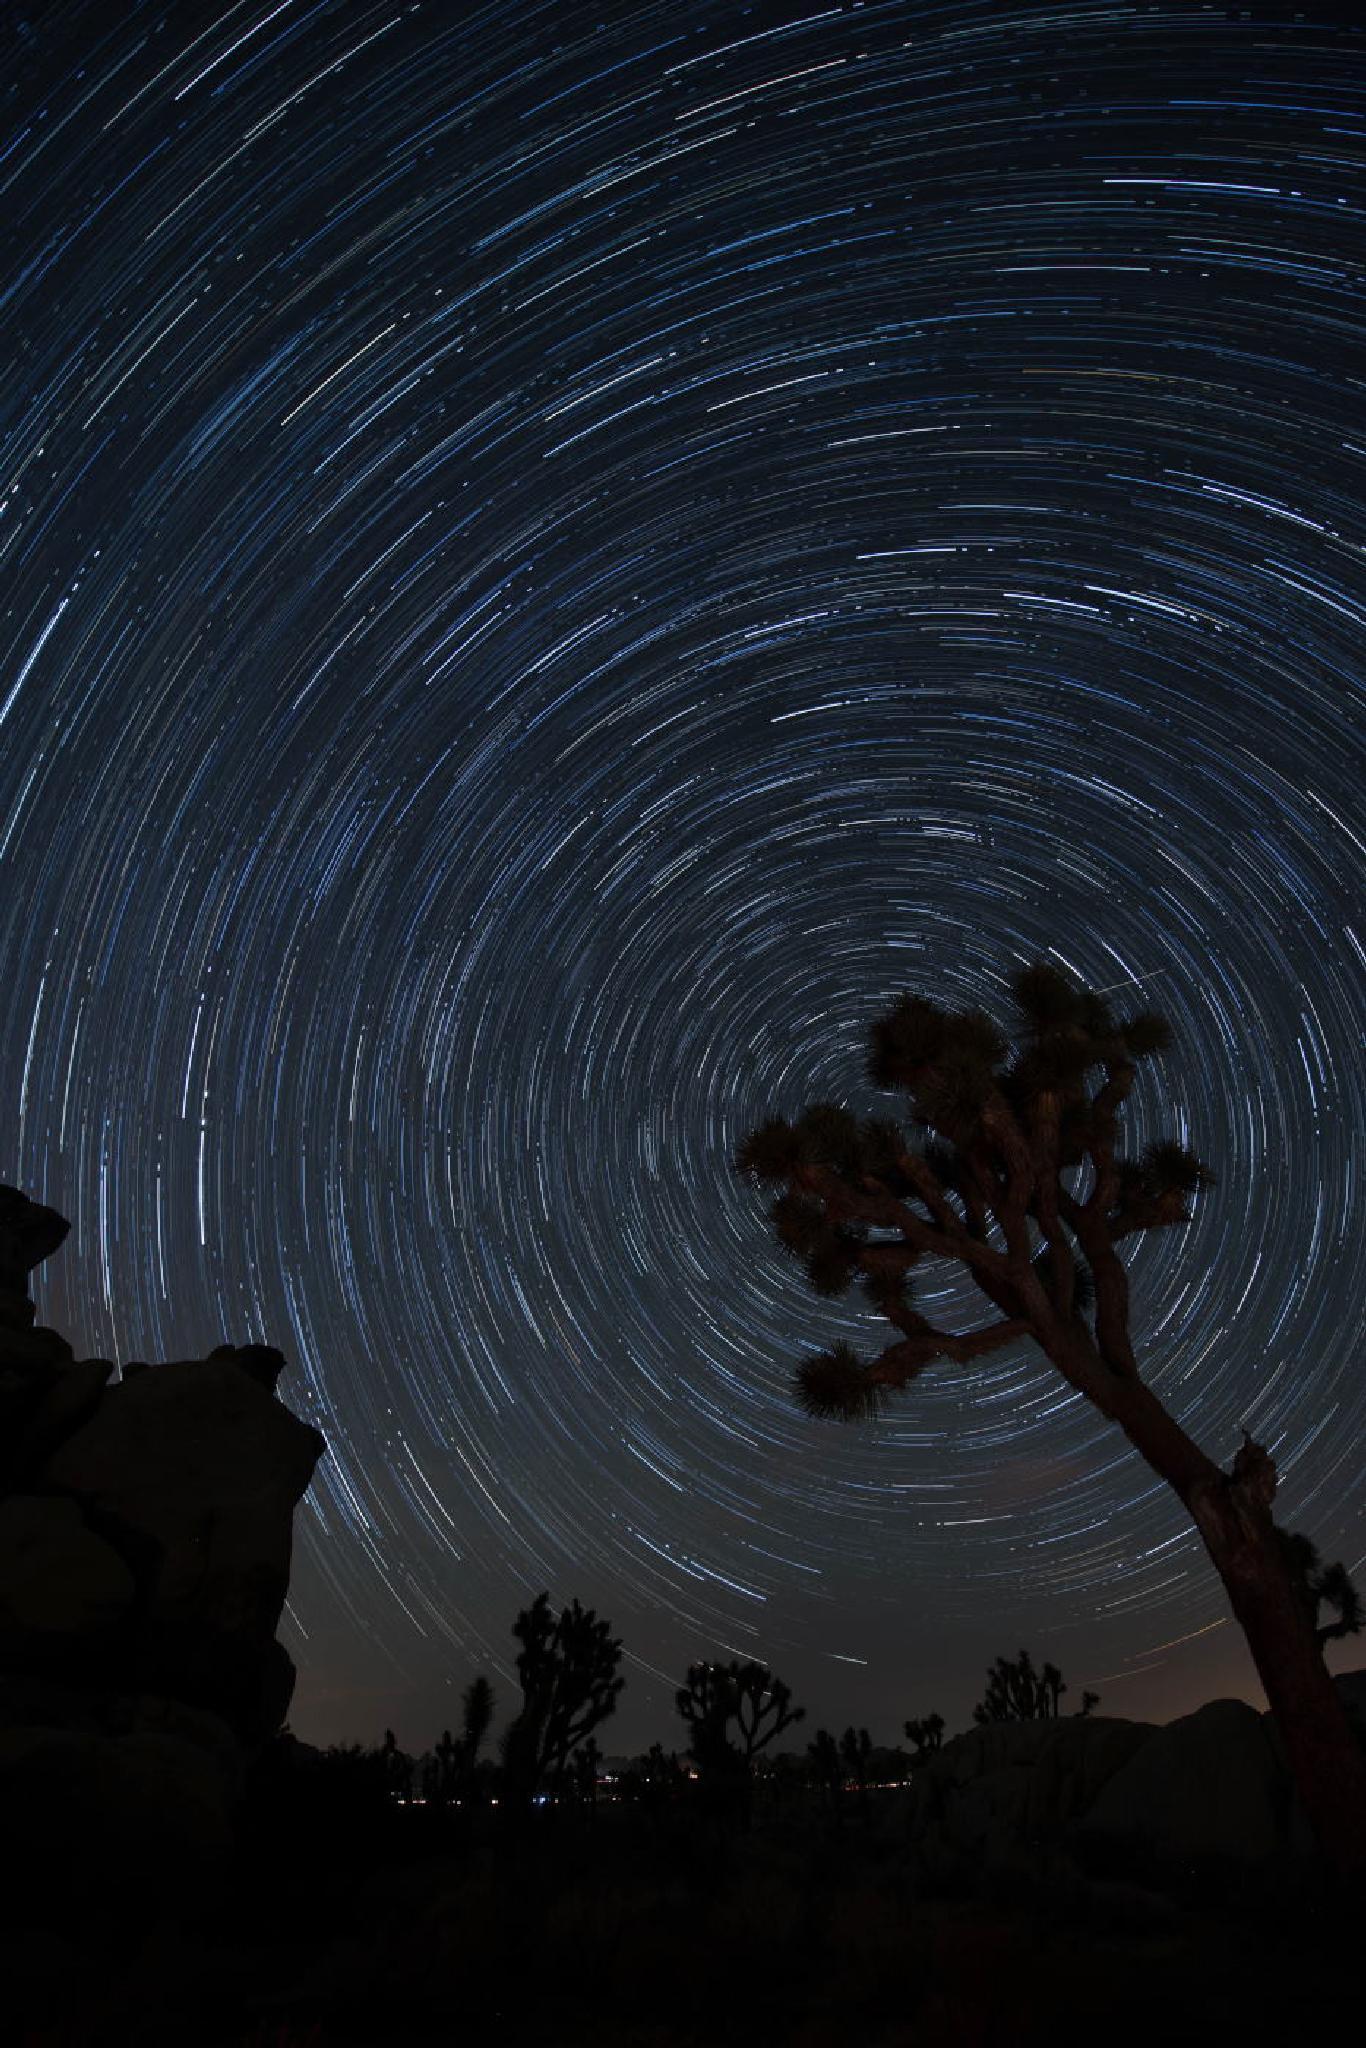 Star Trail at Joshua Tree NP by hirootani